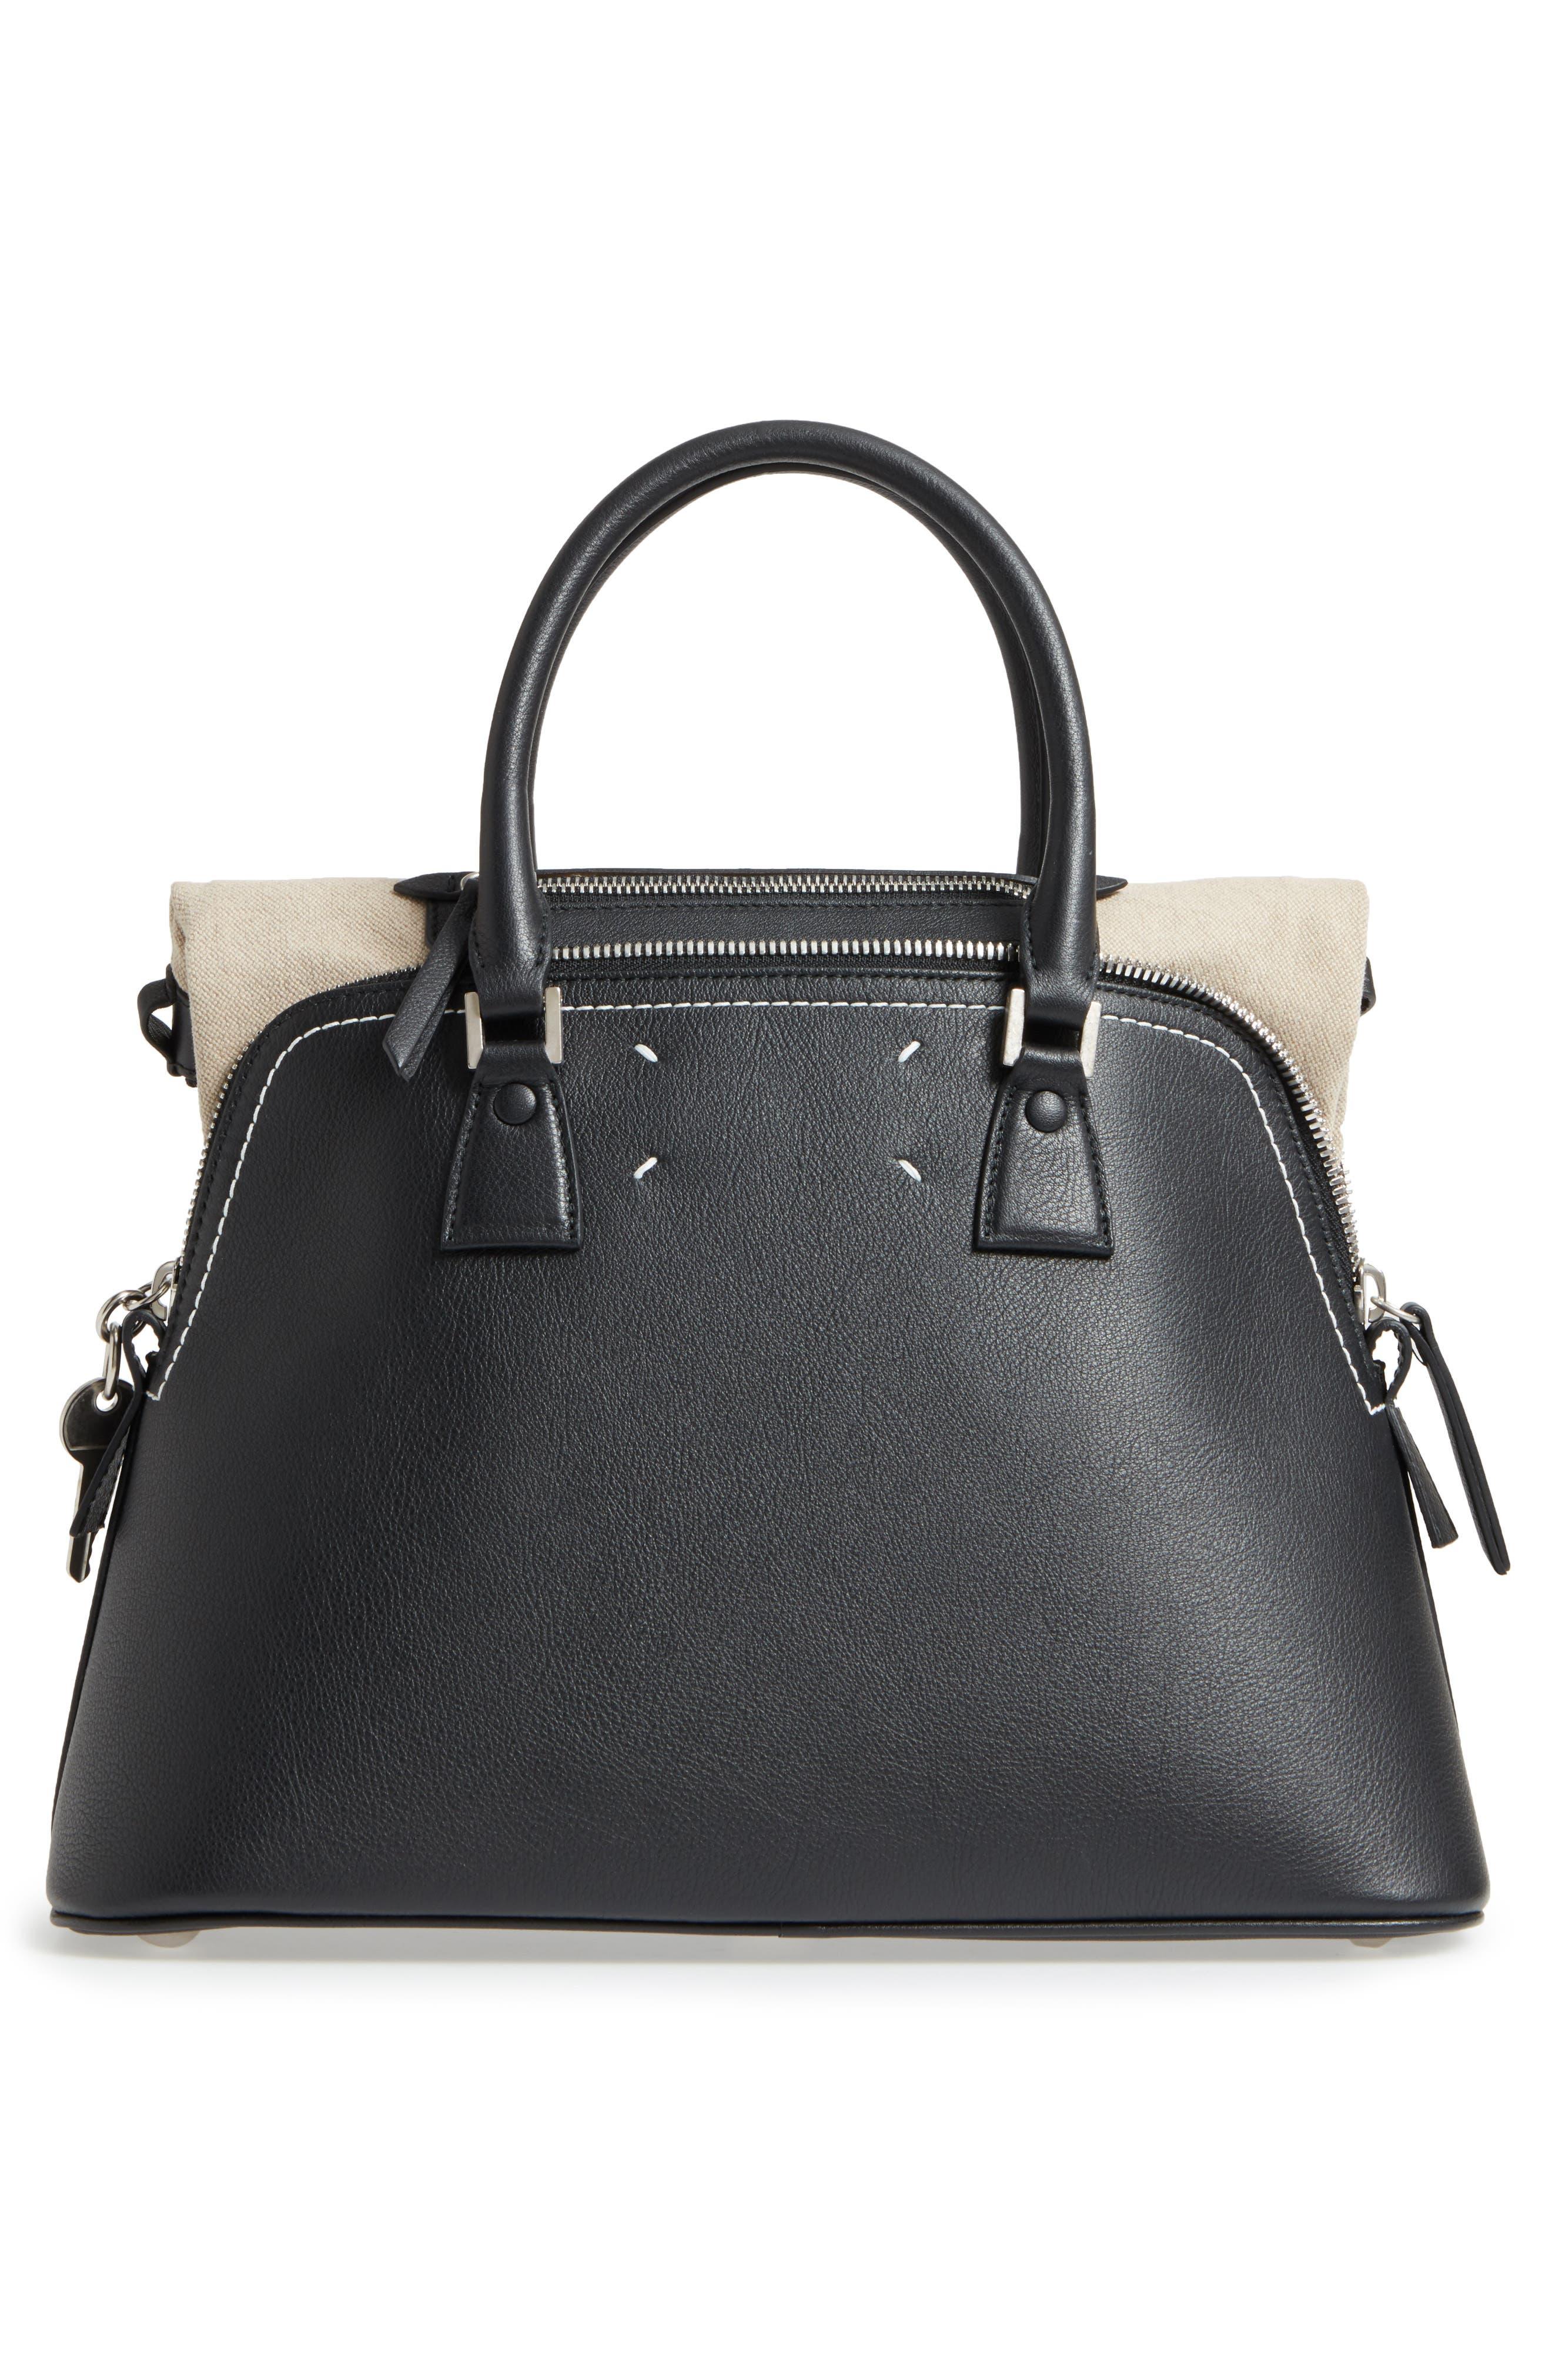 Medium 5AC Leather Handbag,                             Alternate thumbnail 3, color,                             001